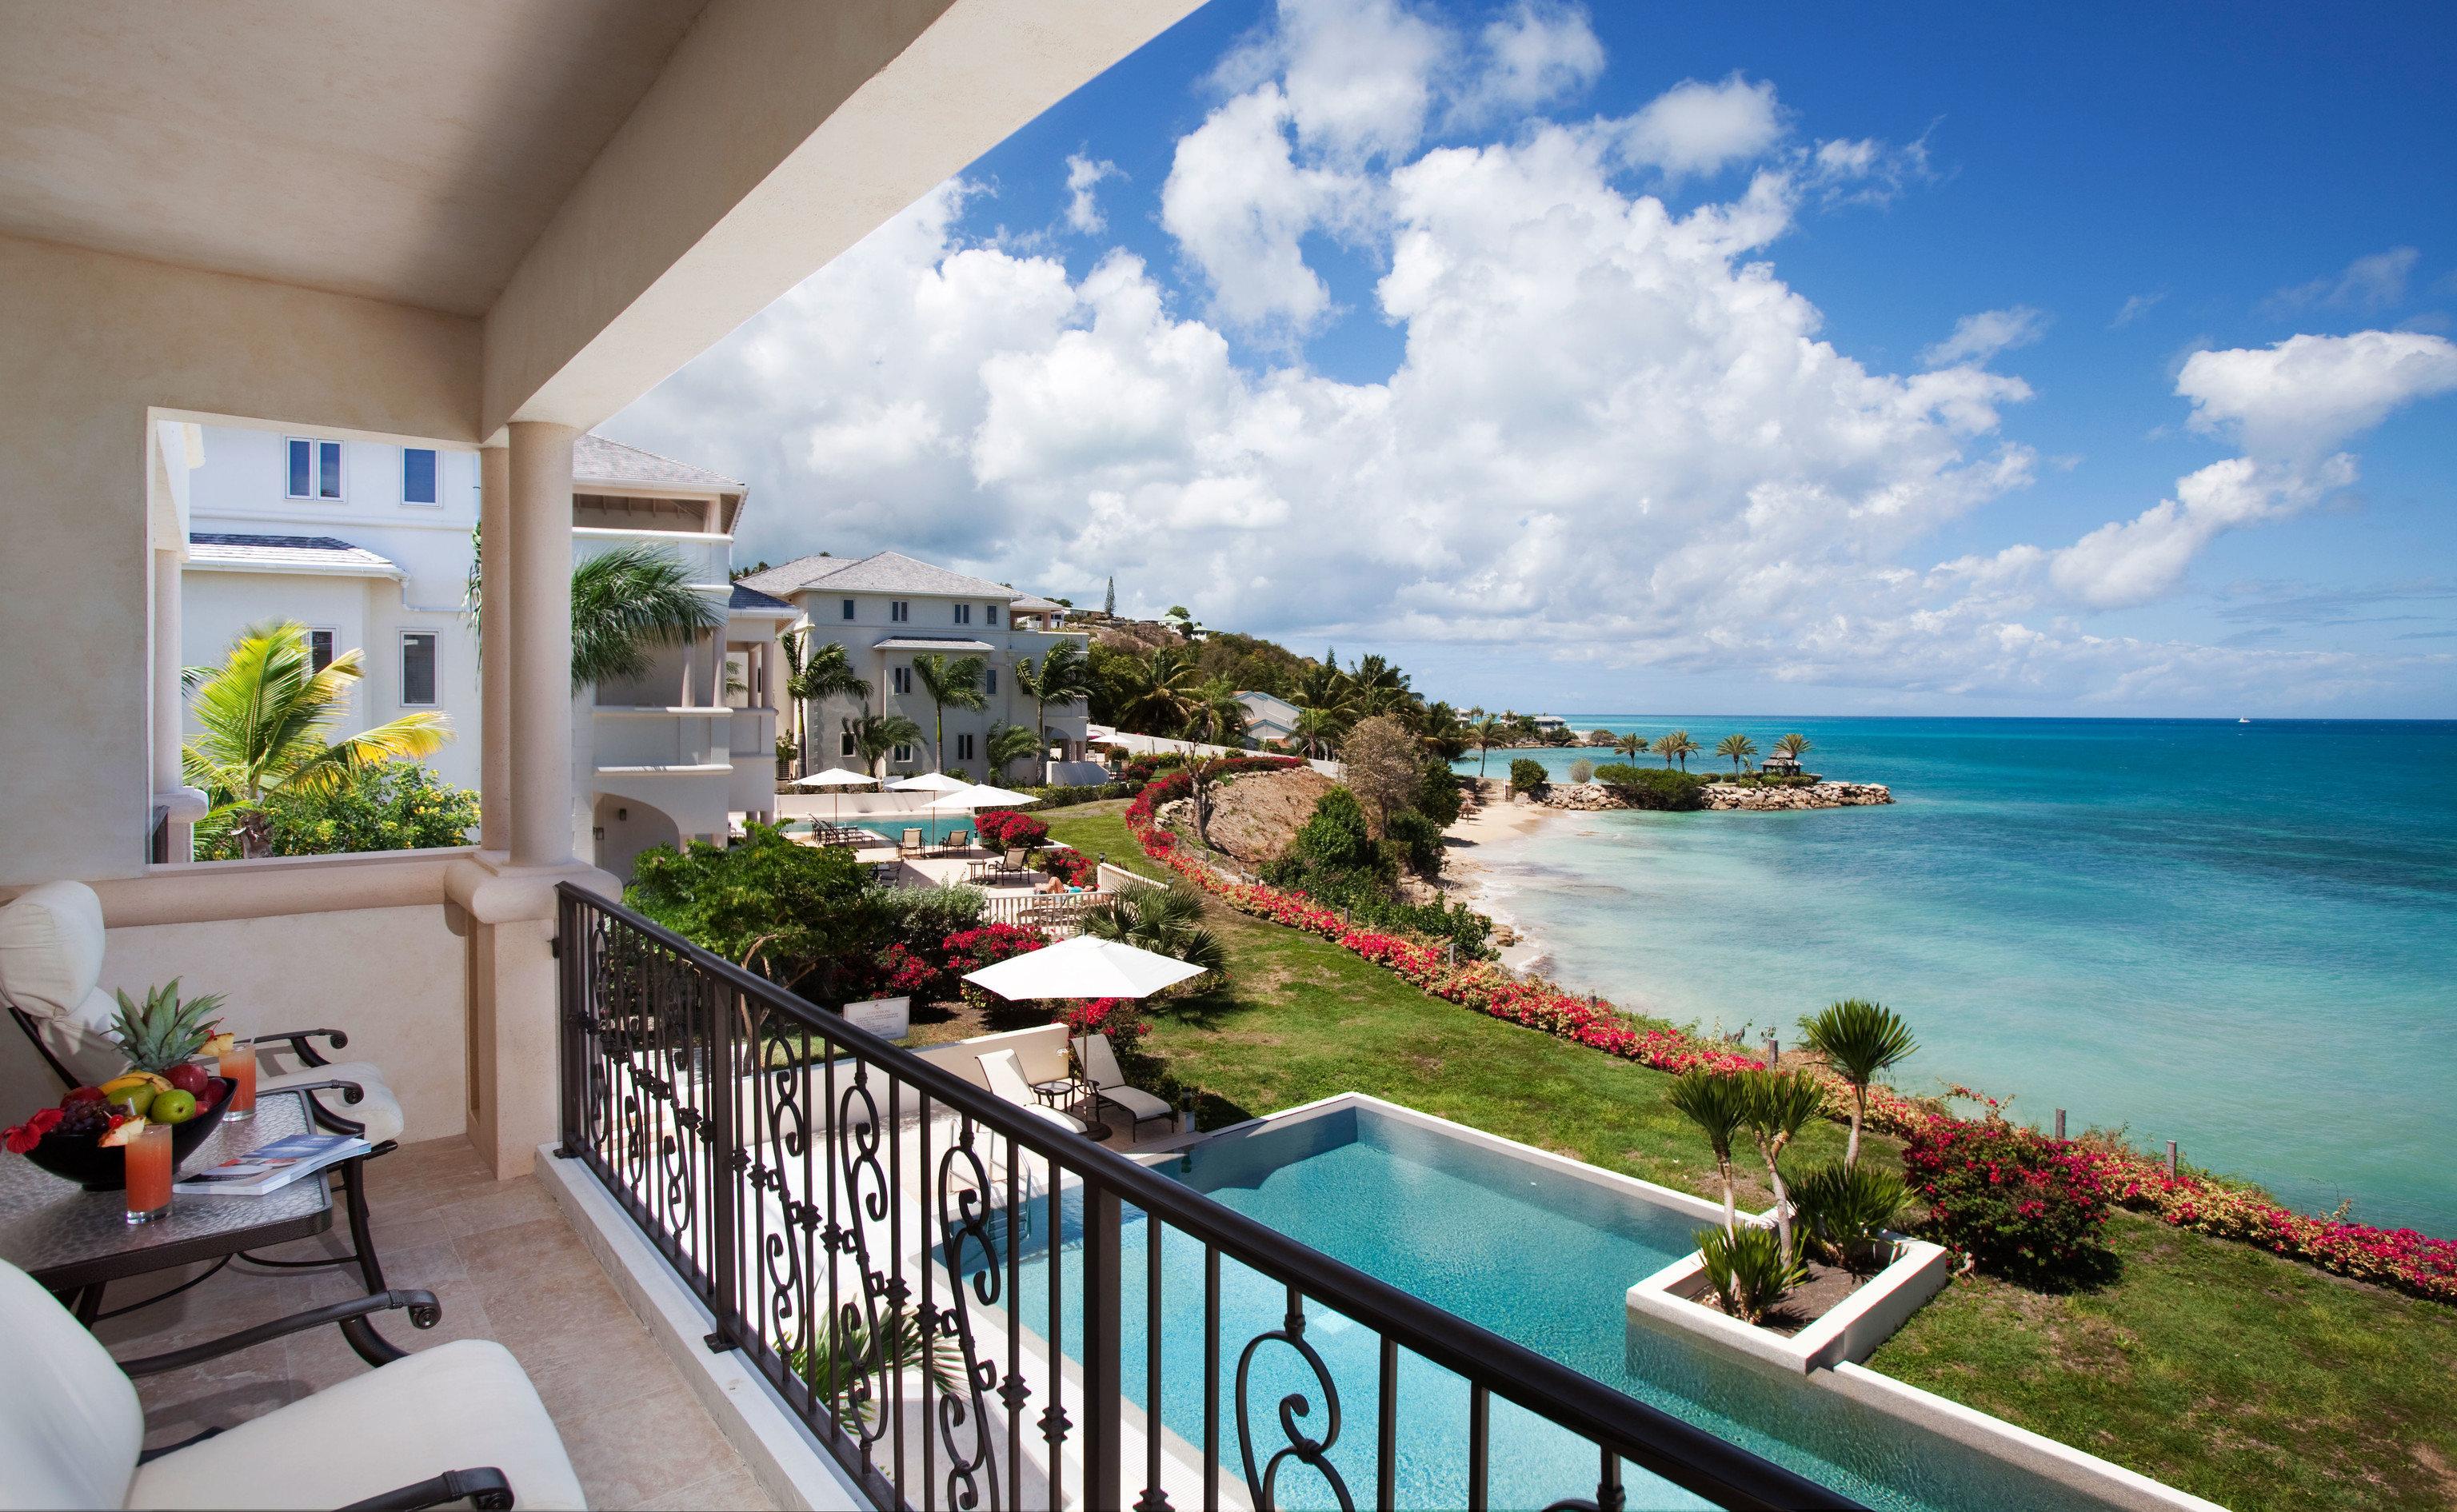 Hotels Trip Ideas sky property leisure caribbean Resort swimming pool home Villa condominium Deck porch overlooking